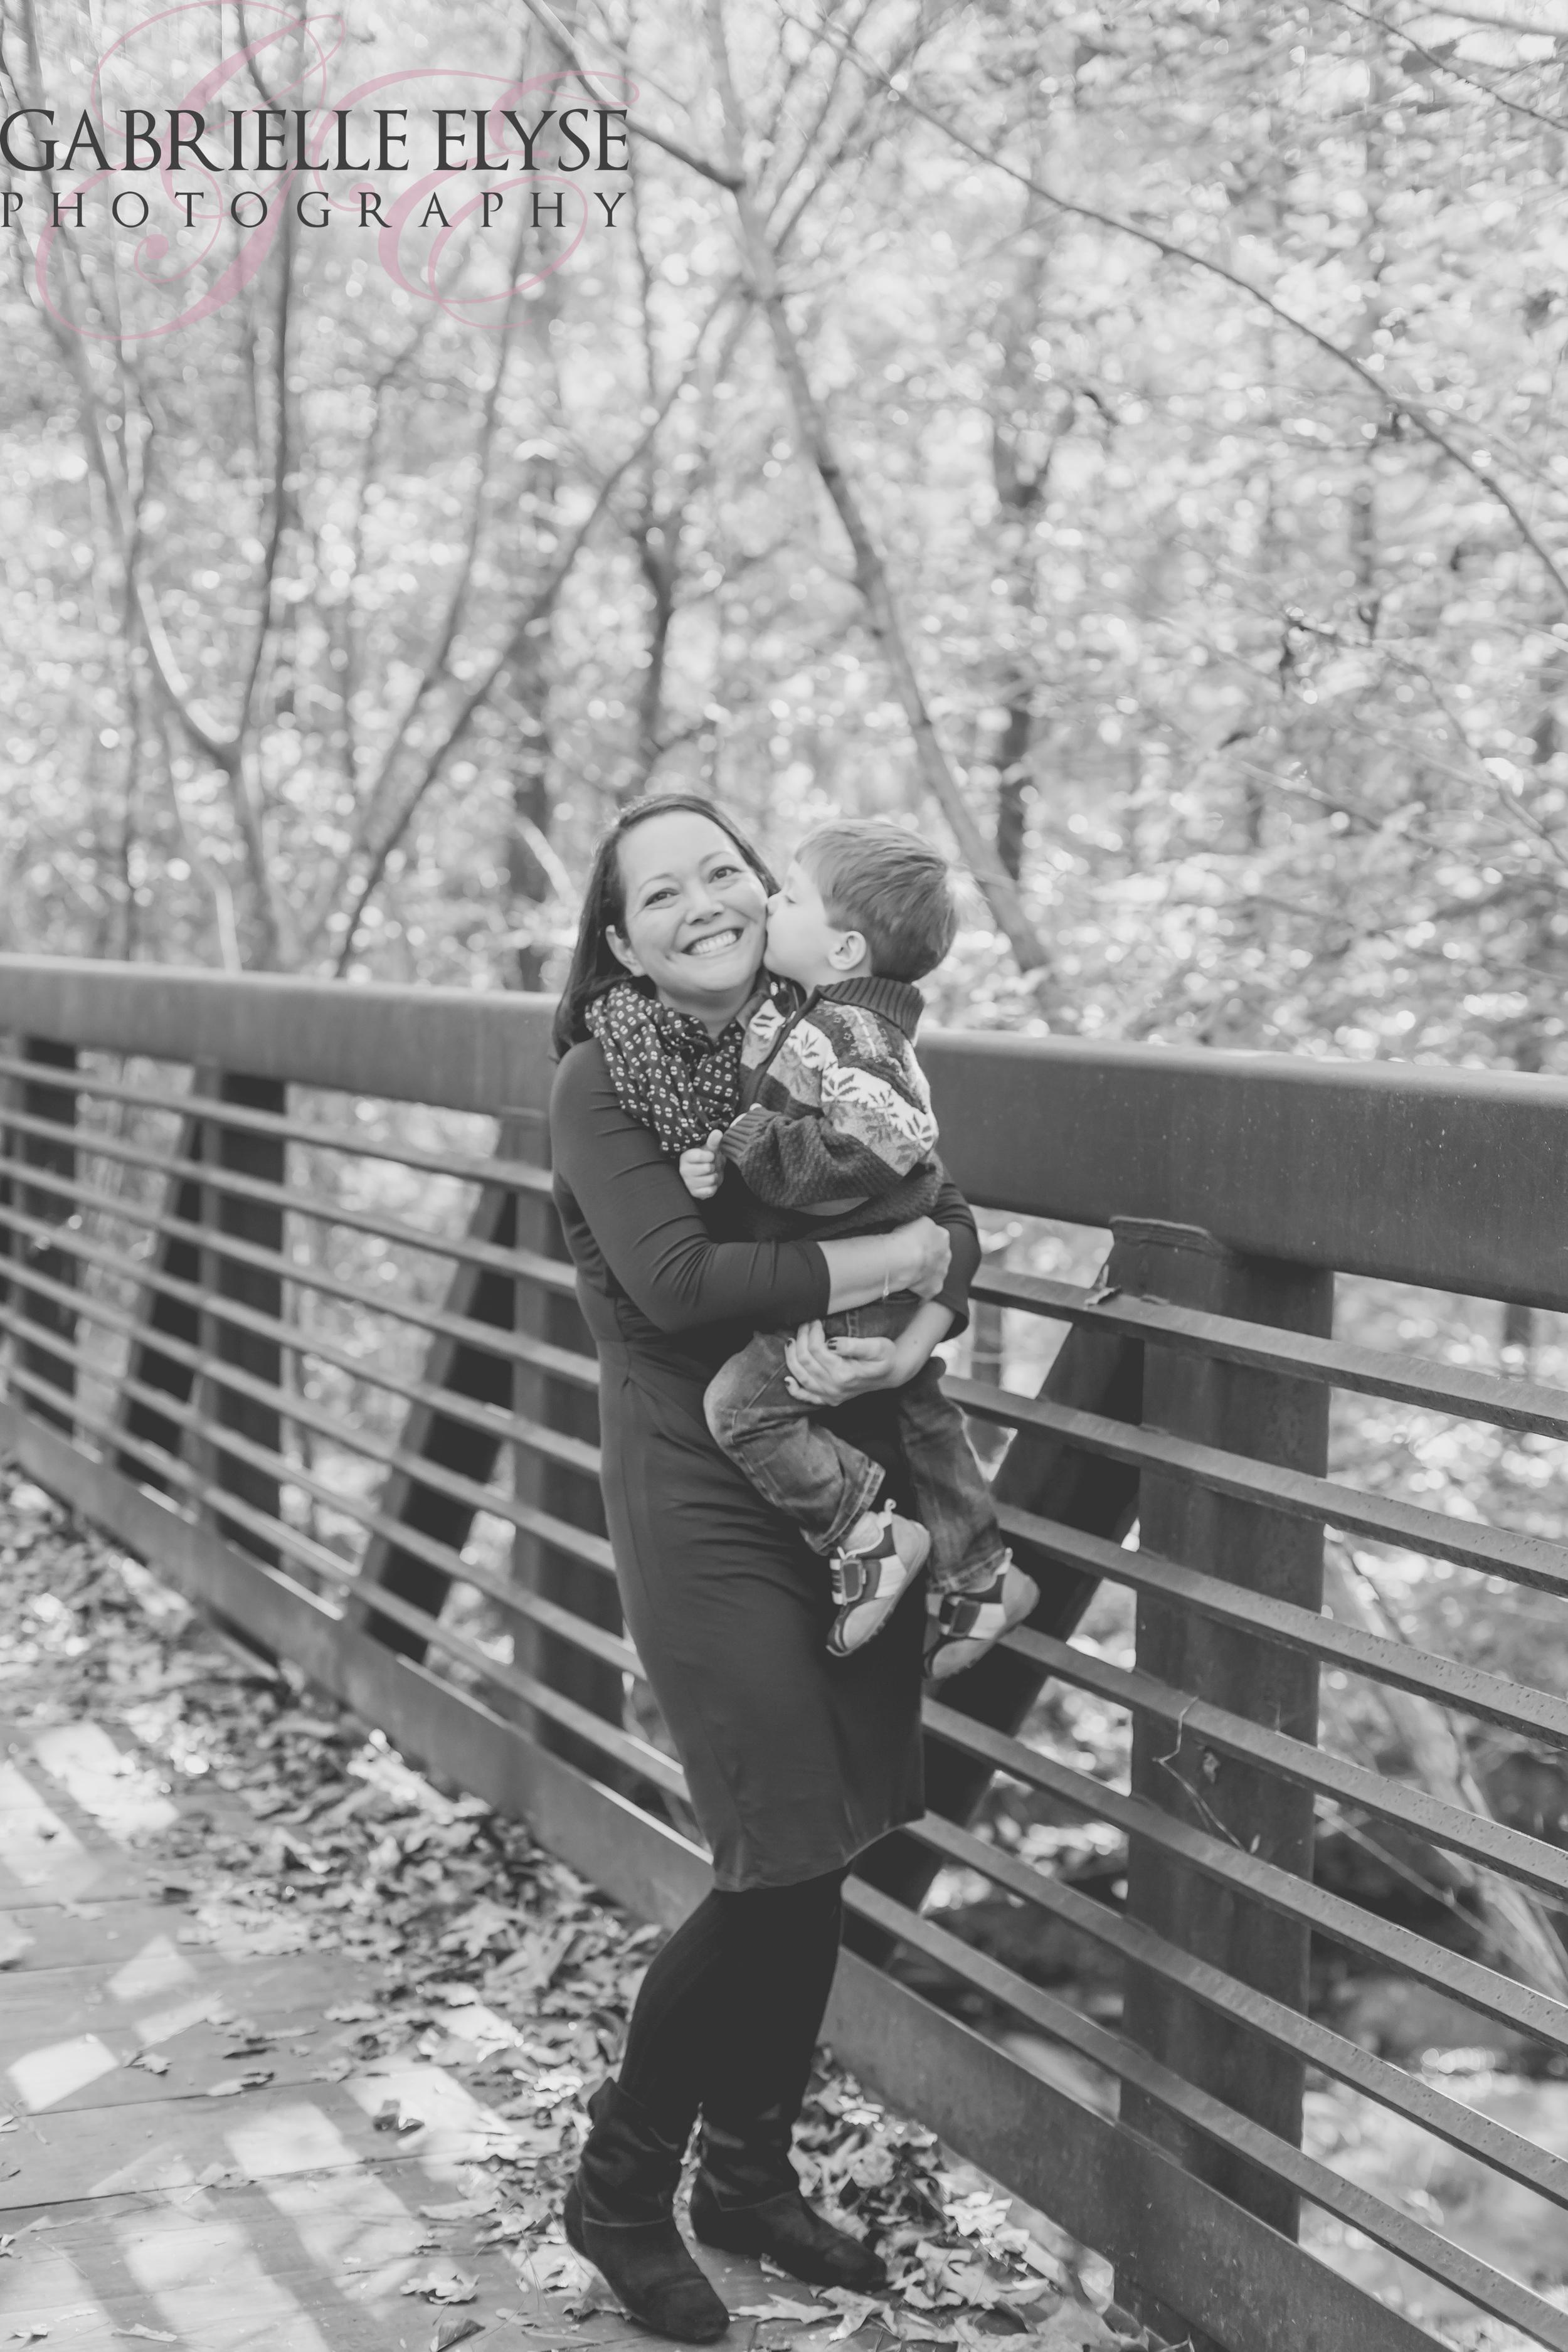 Mr I loving on his momma!